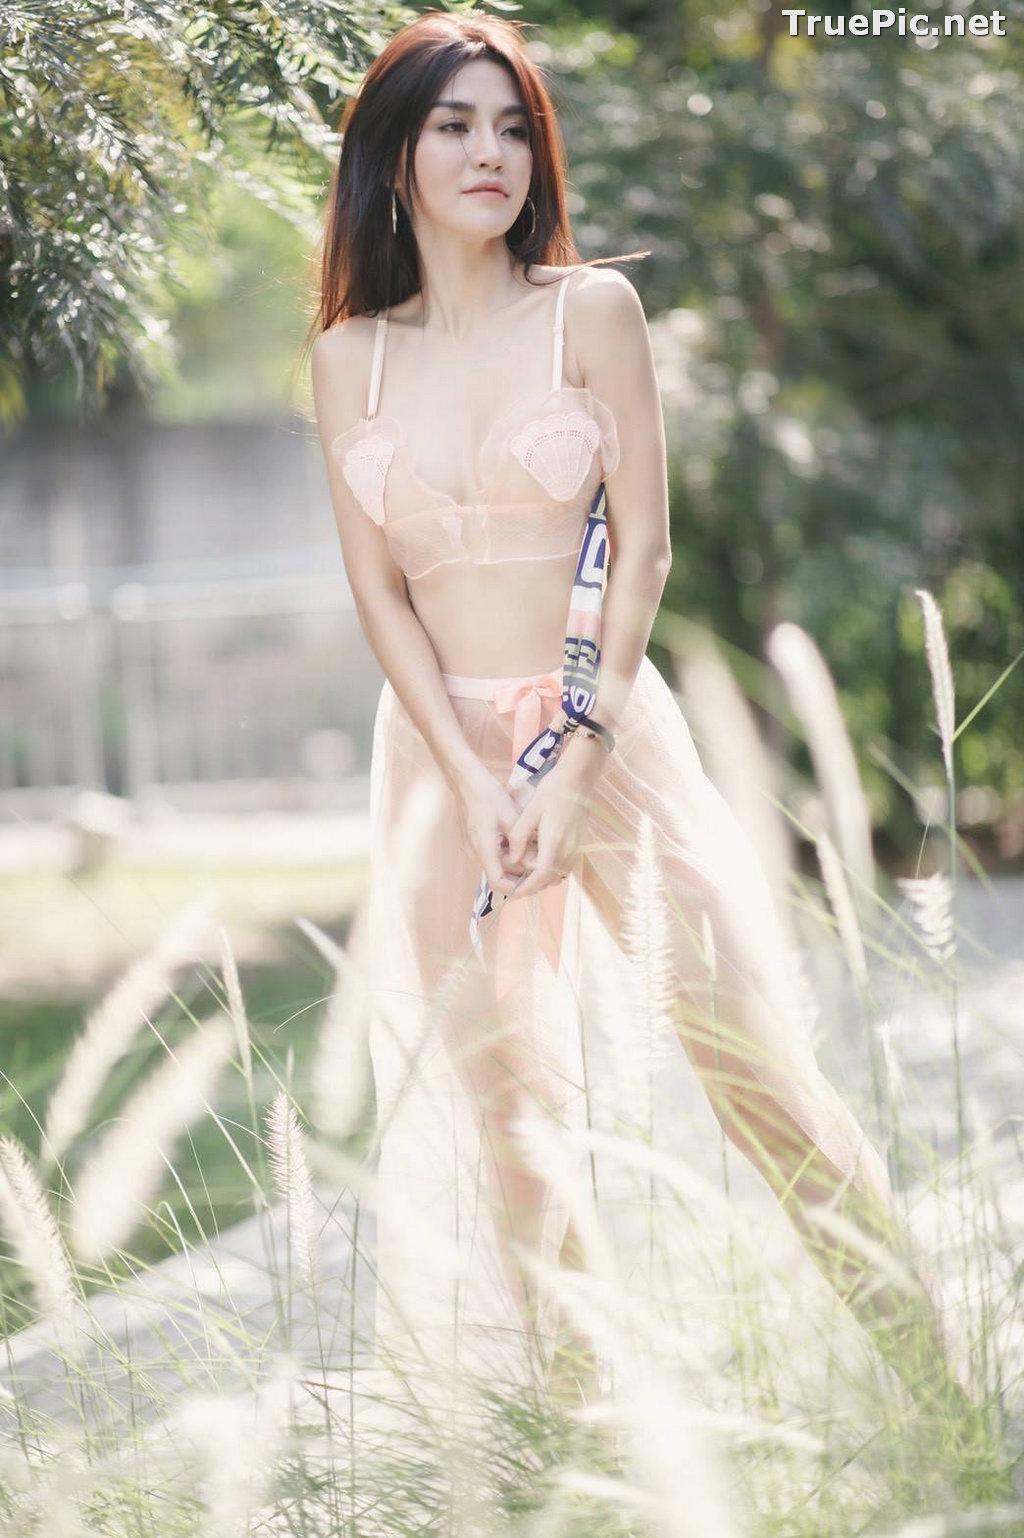 Image Thailand Model - ลฎาภา รัชตะอมรโชติ - Pink Transparent Lingerie - TruePic.net - Picture-5